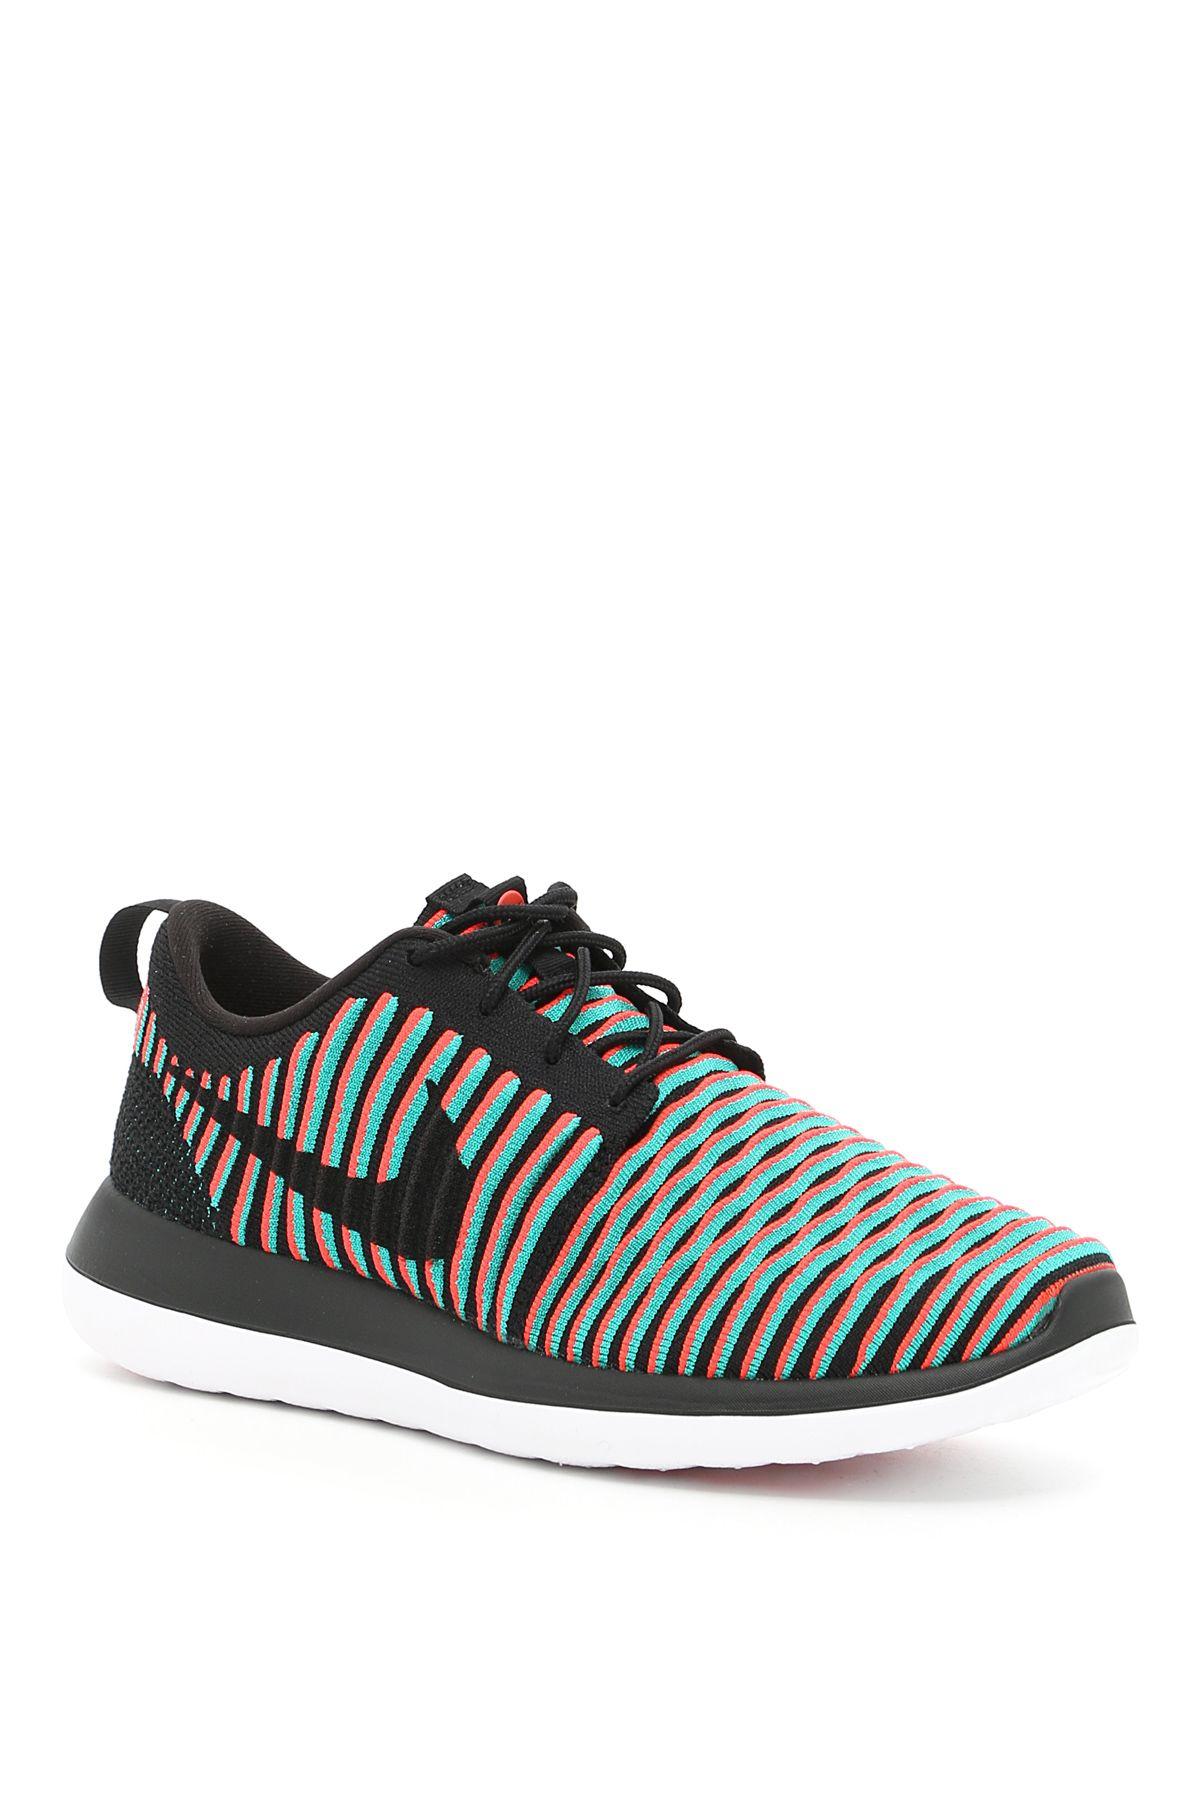 Nike Roshe Two Slyknit Sneakers